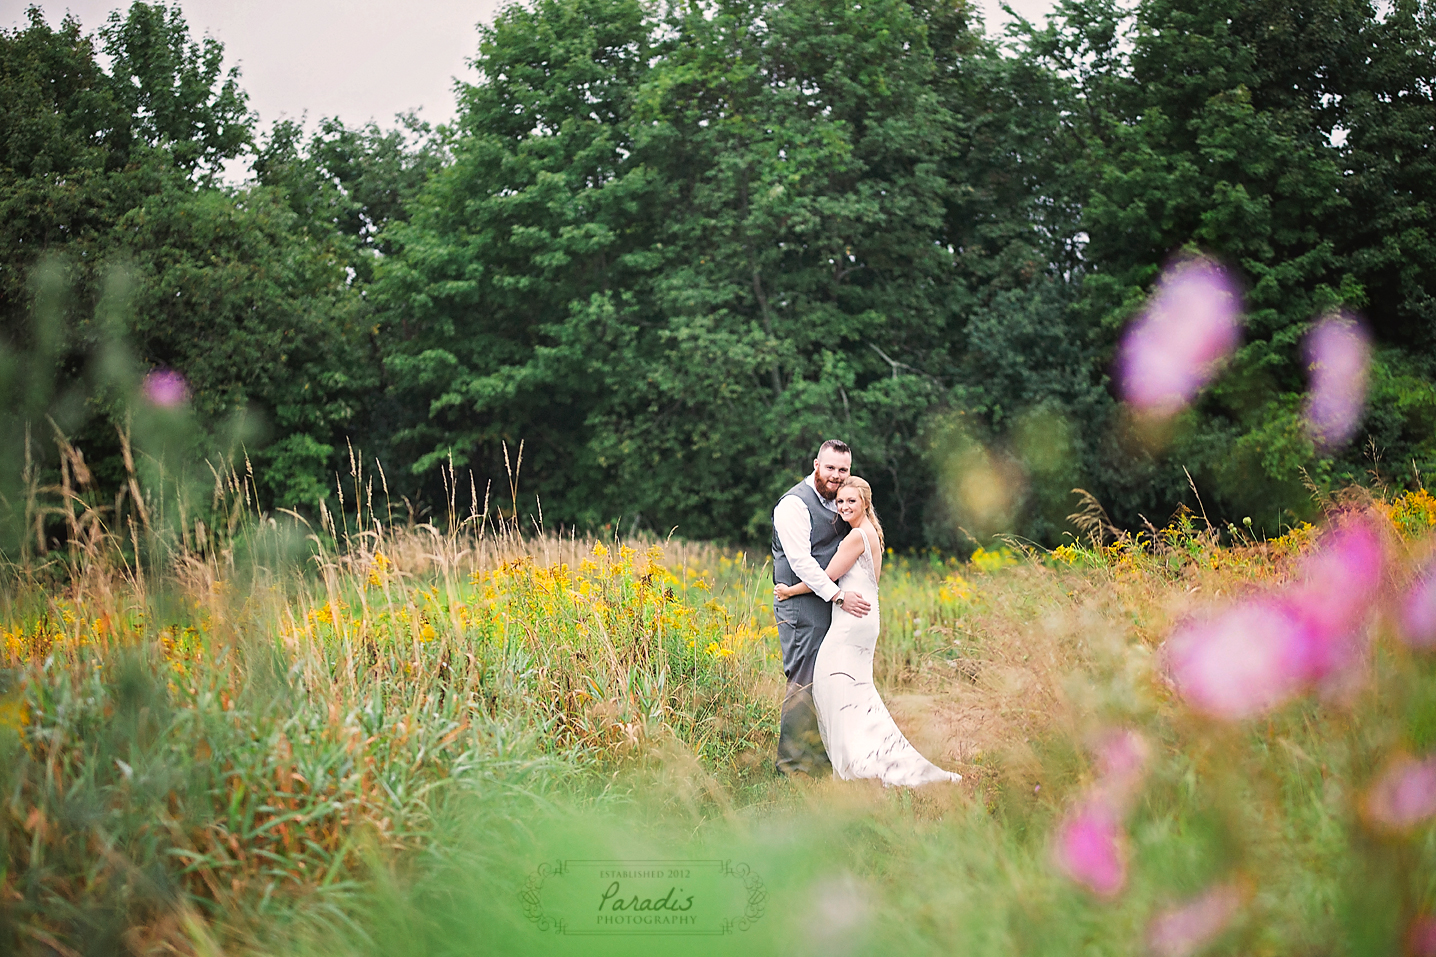 paradis photography maine wedding photographer field portraits flowers